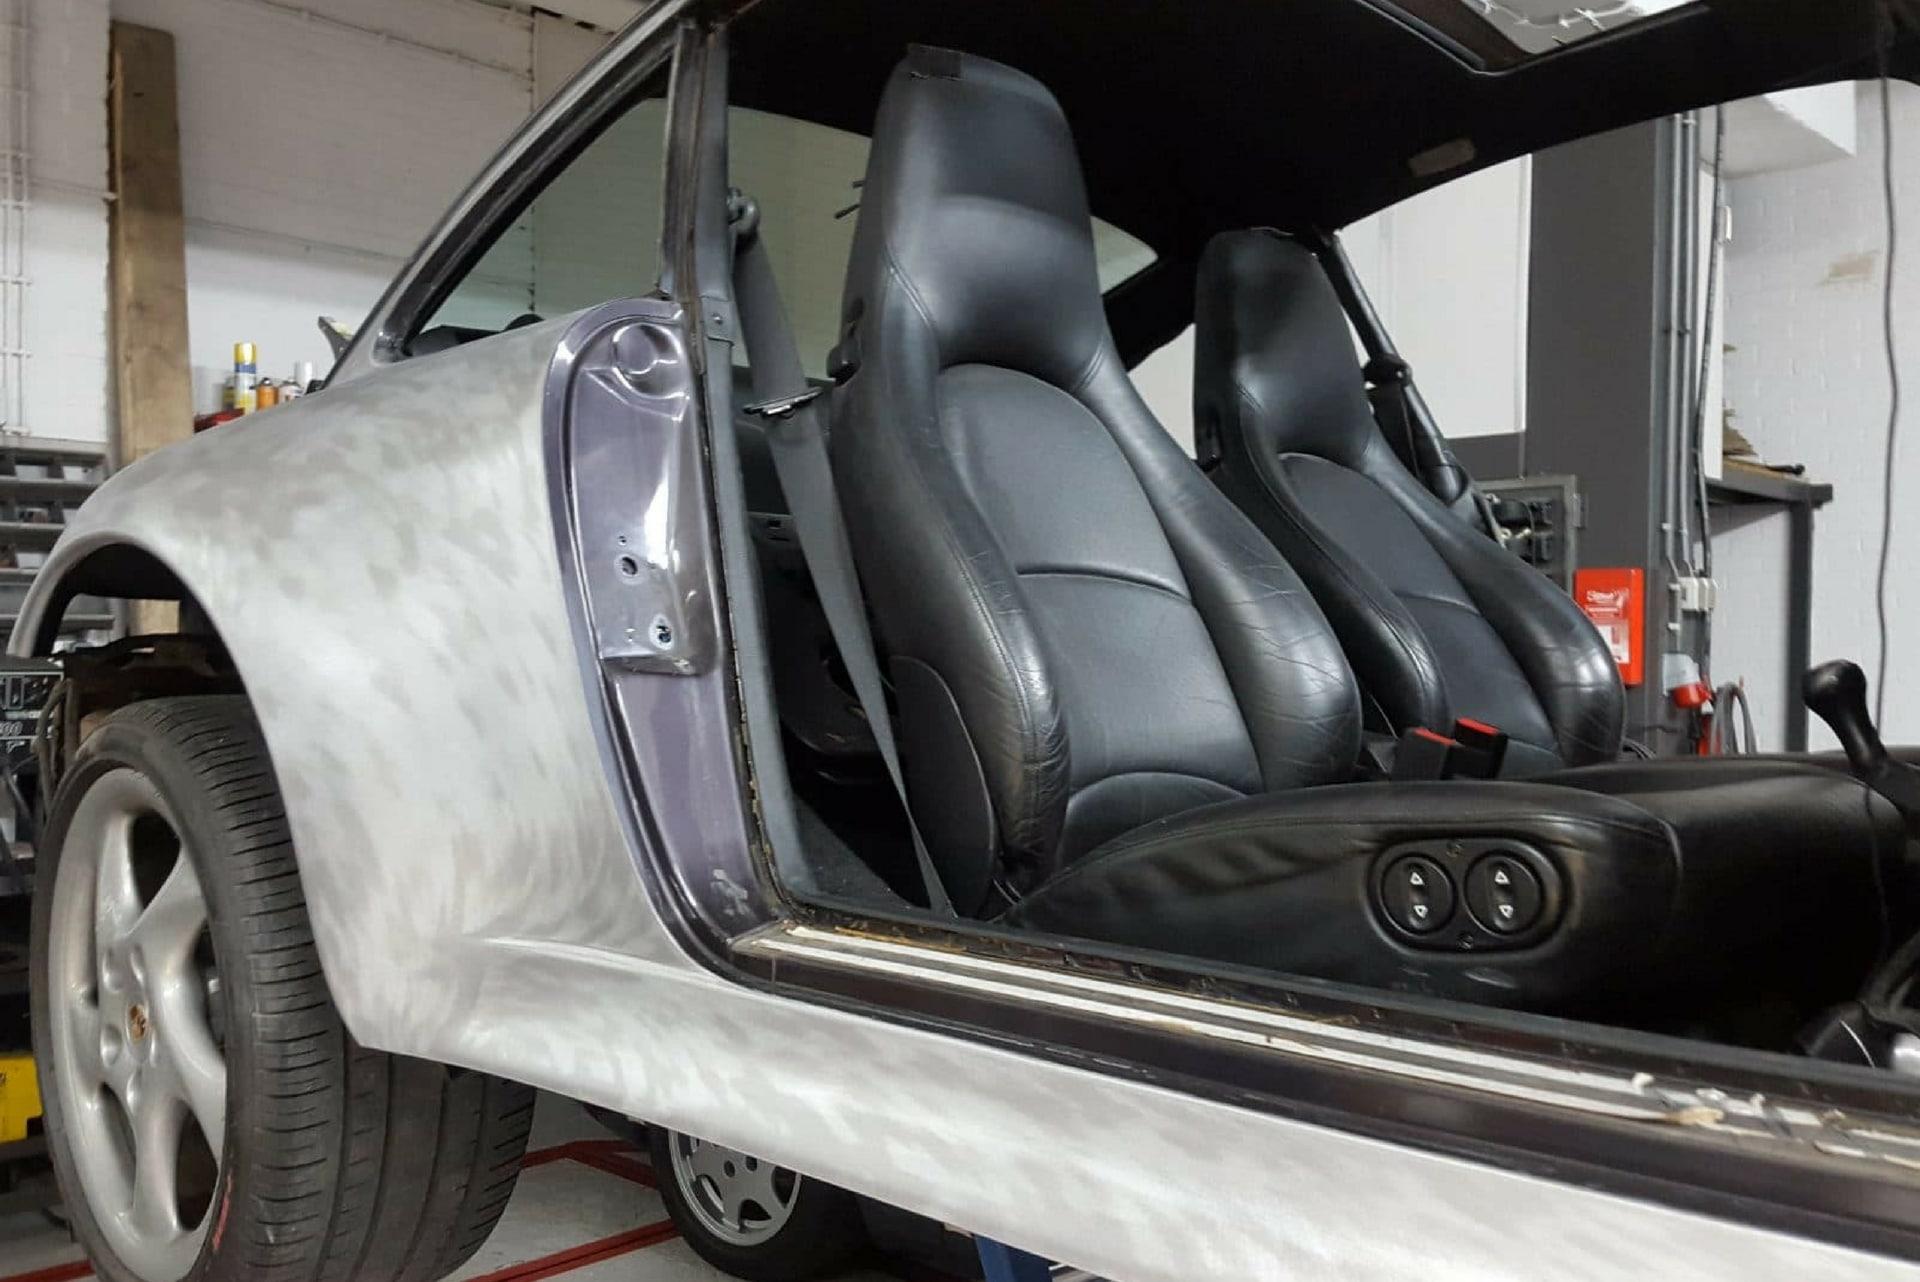 Porsche Carrosserie herstel